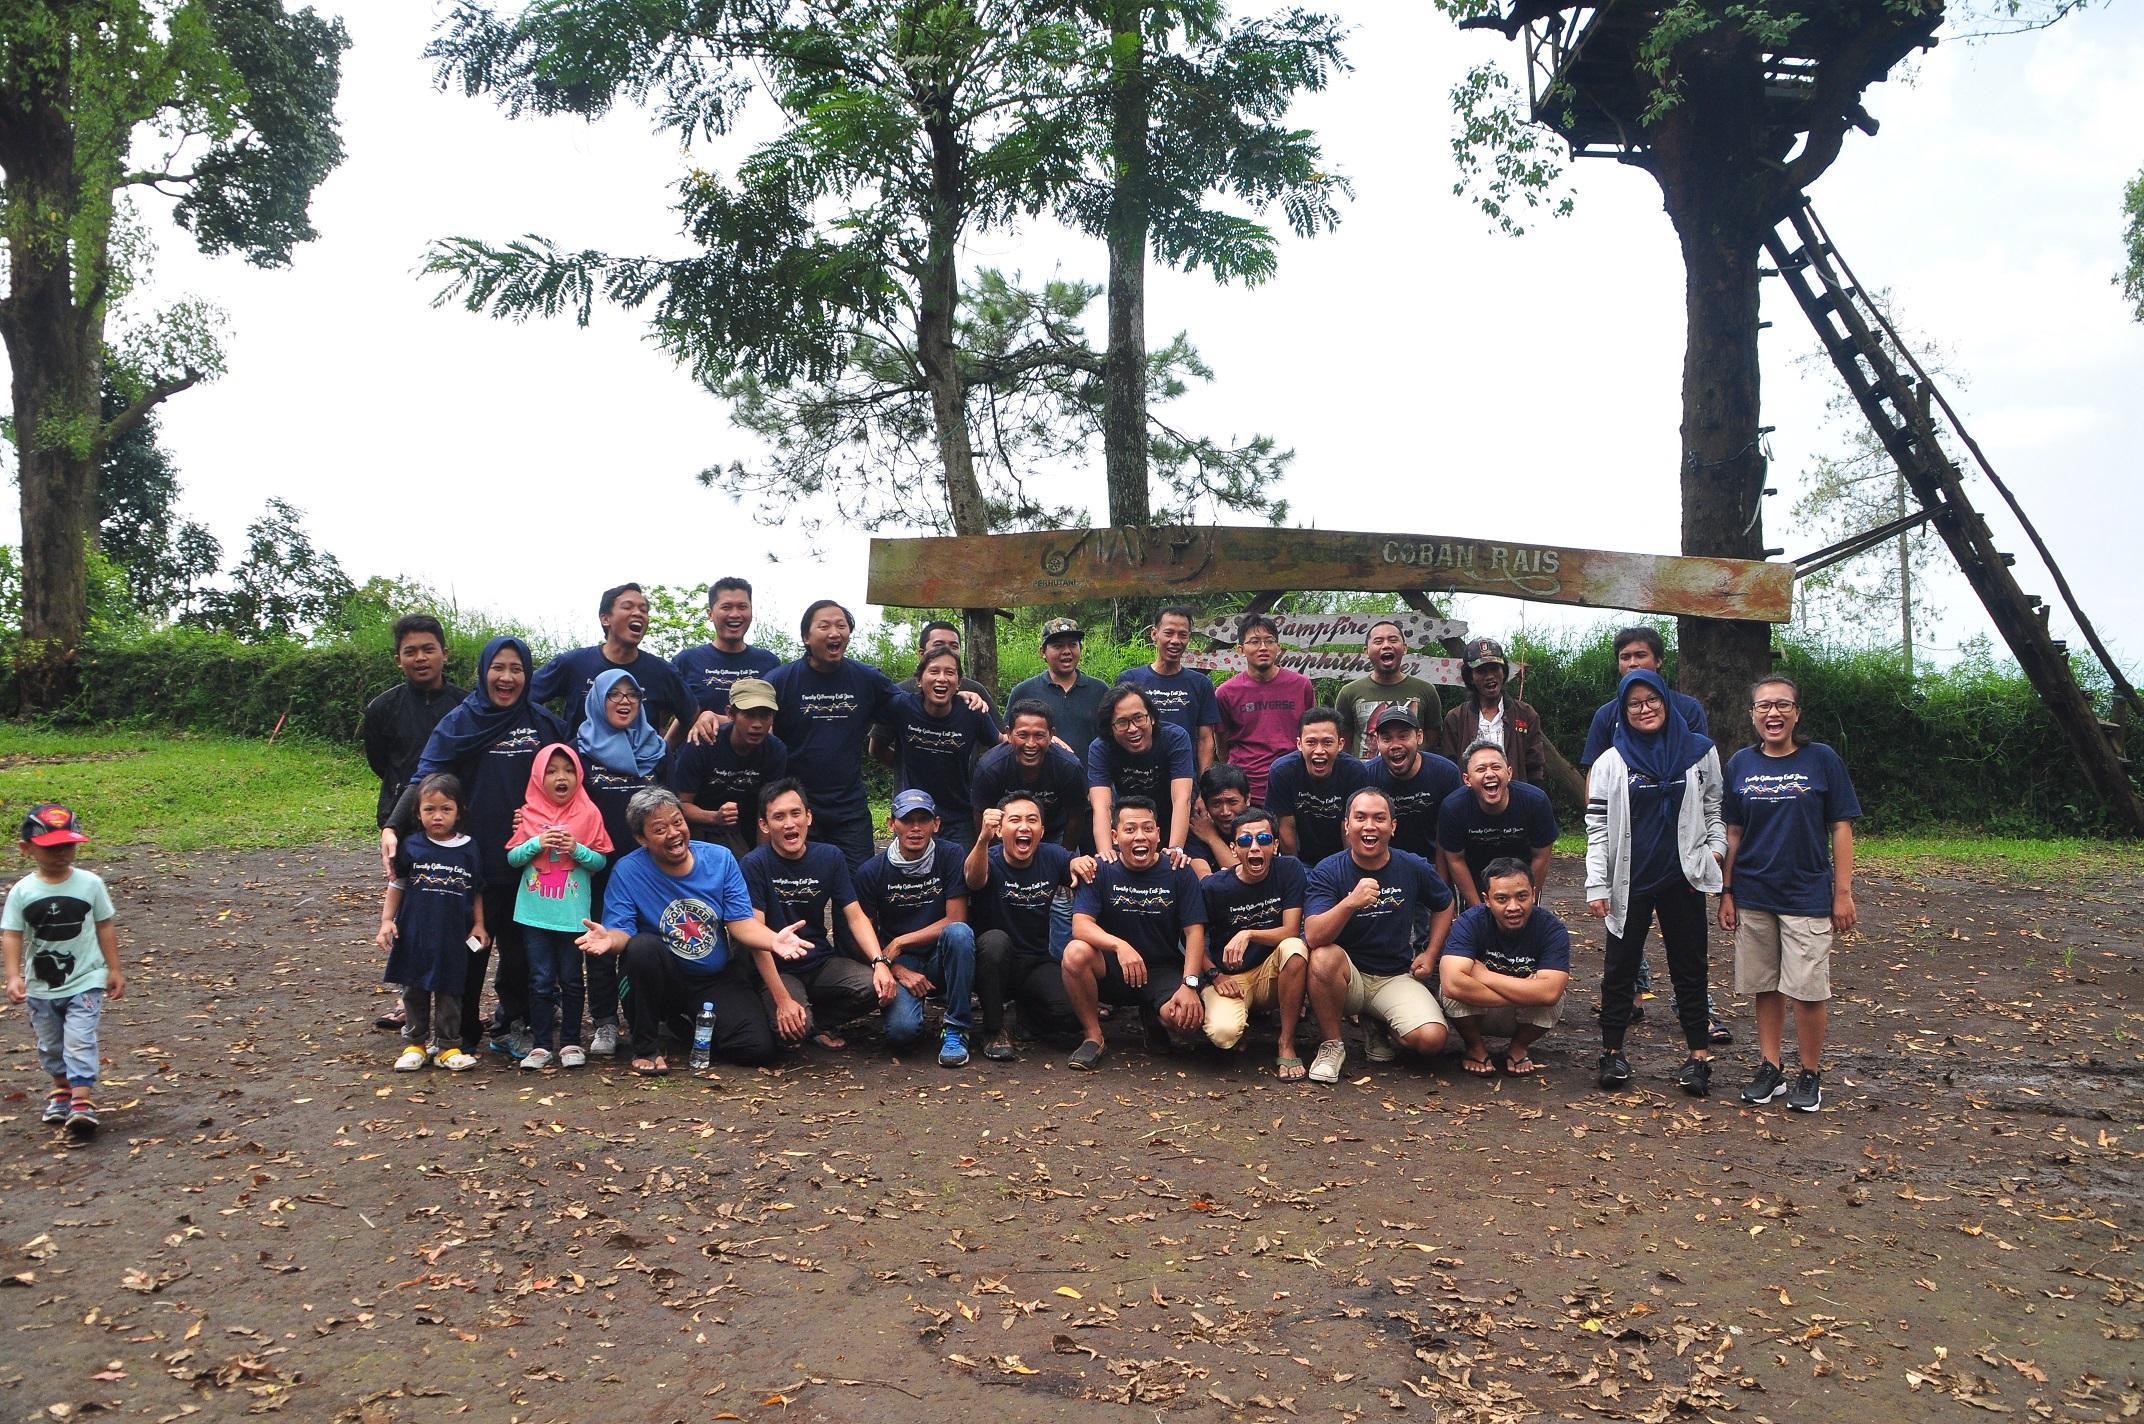 Tempat Terbaik untuk Berekreasi di Malang